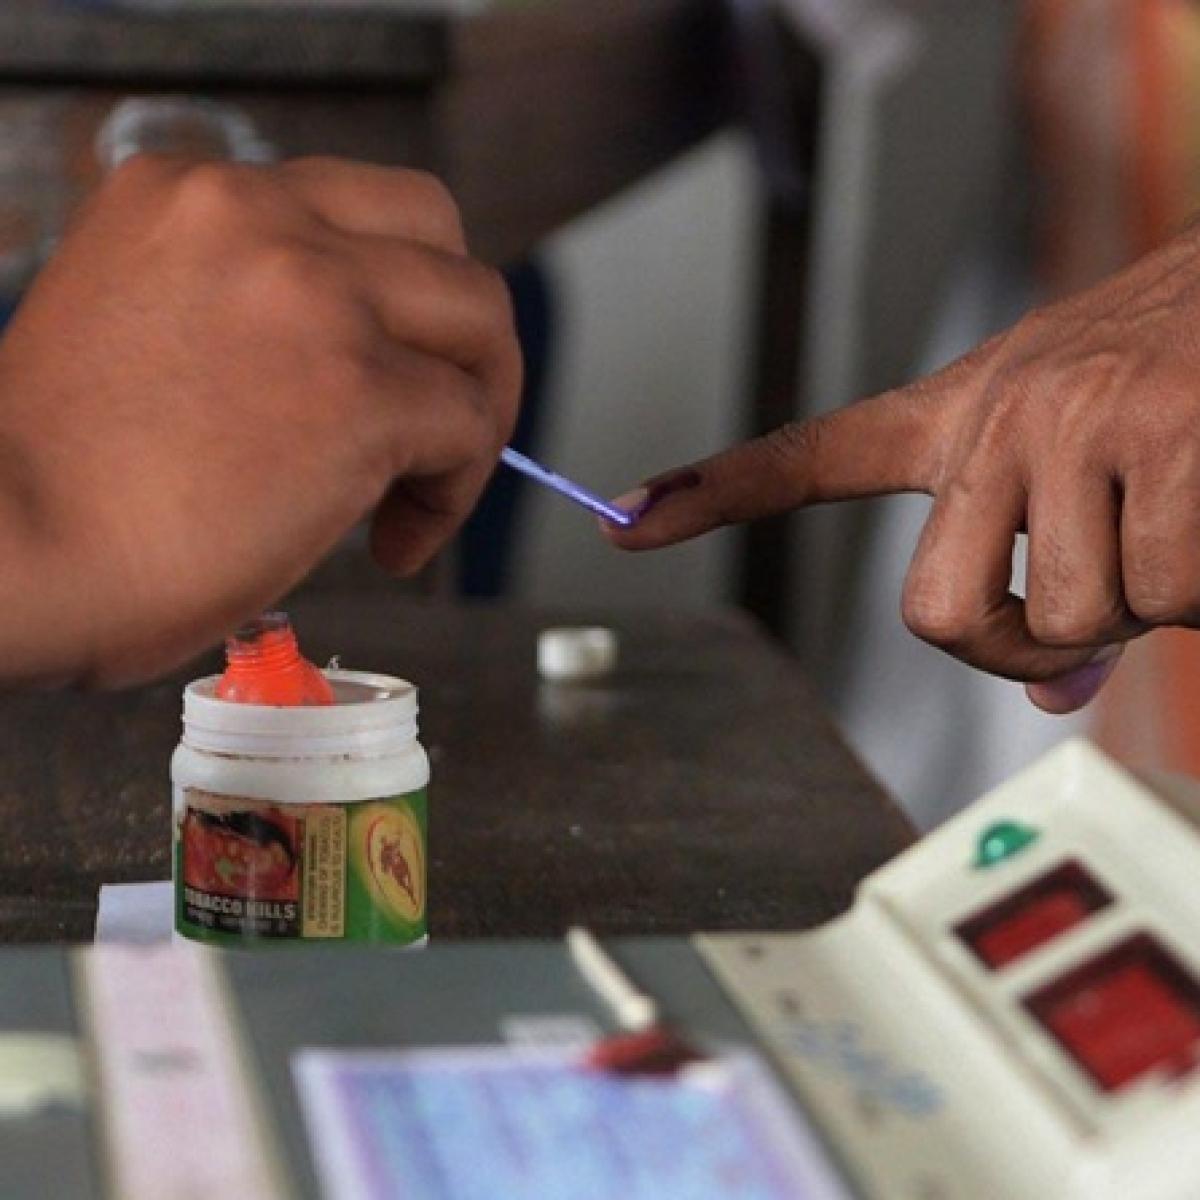 NGO study finds average assets of new Maharashtra MLAs jump 107% from 2014